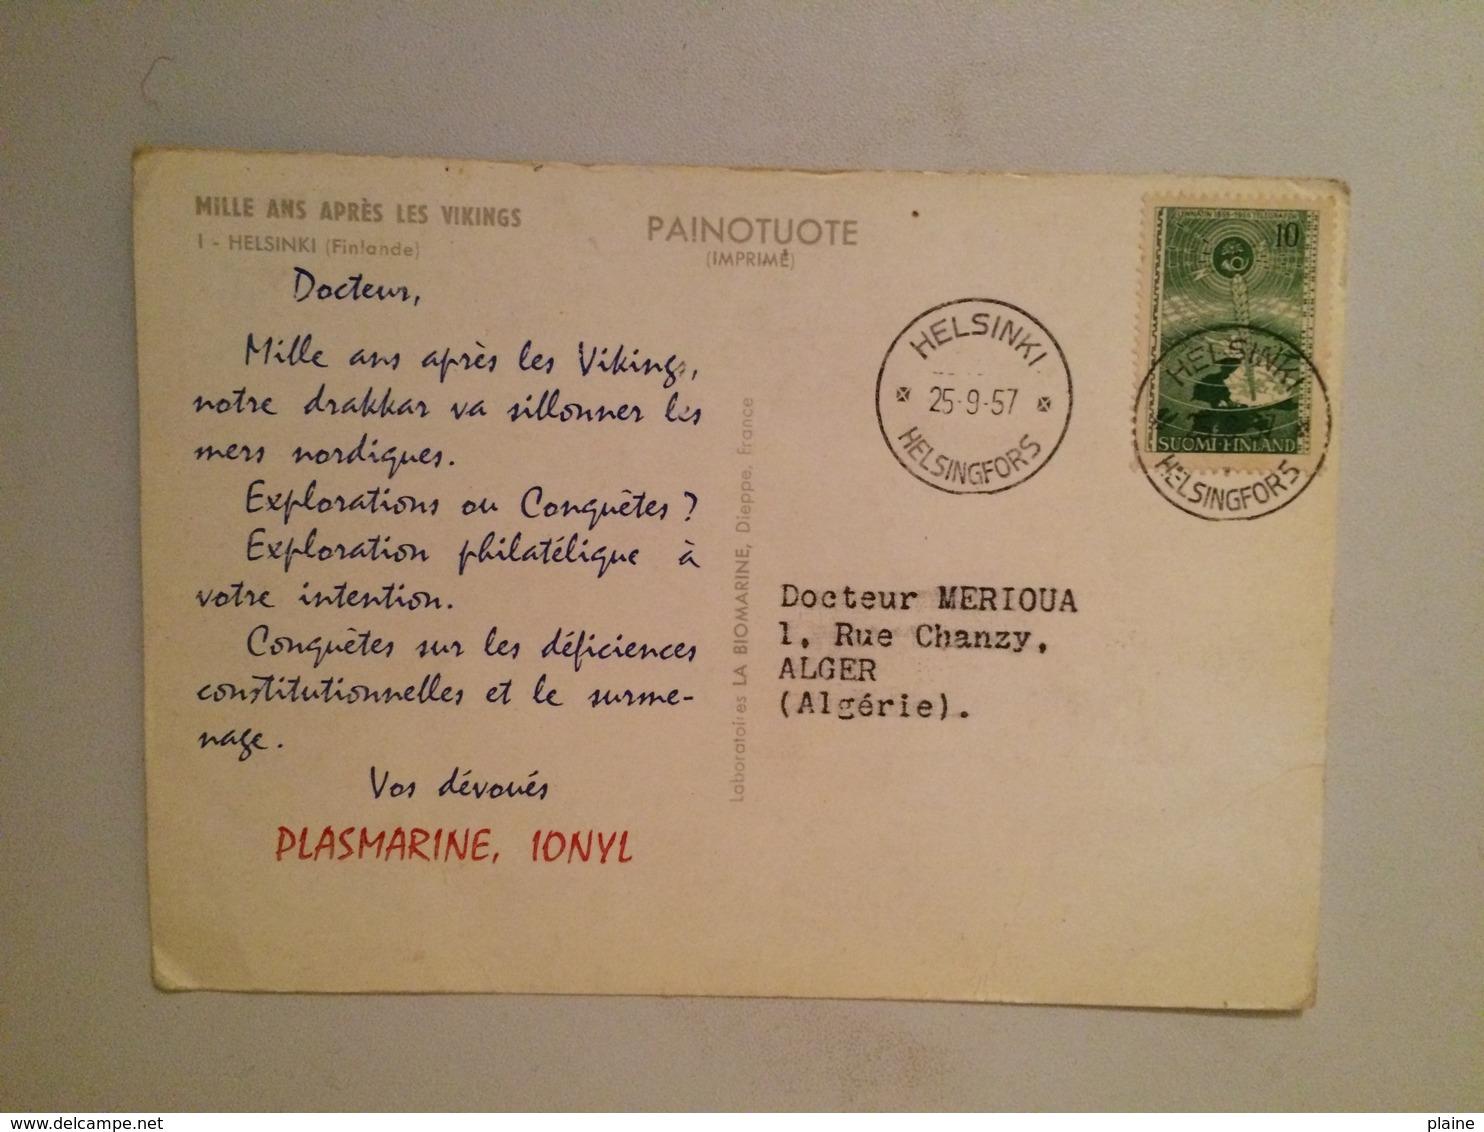 CARTE POSTALE FINLAND-HELSINKI-MILLE AN APRES LES VIKINGS -PUBLICITE IONYL-1957 - Finlande